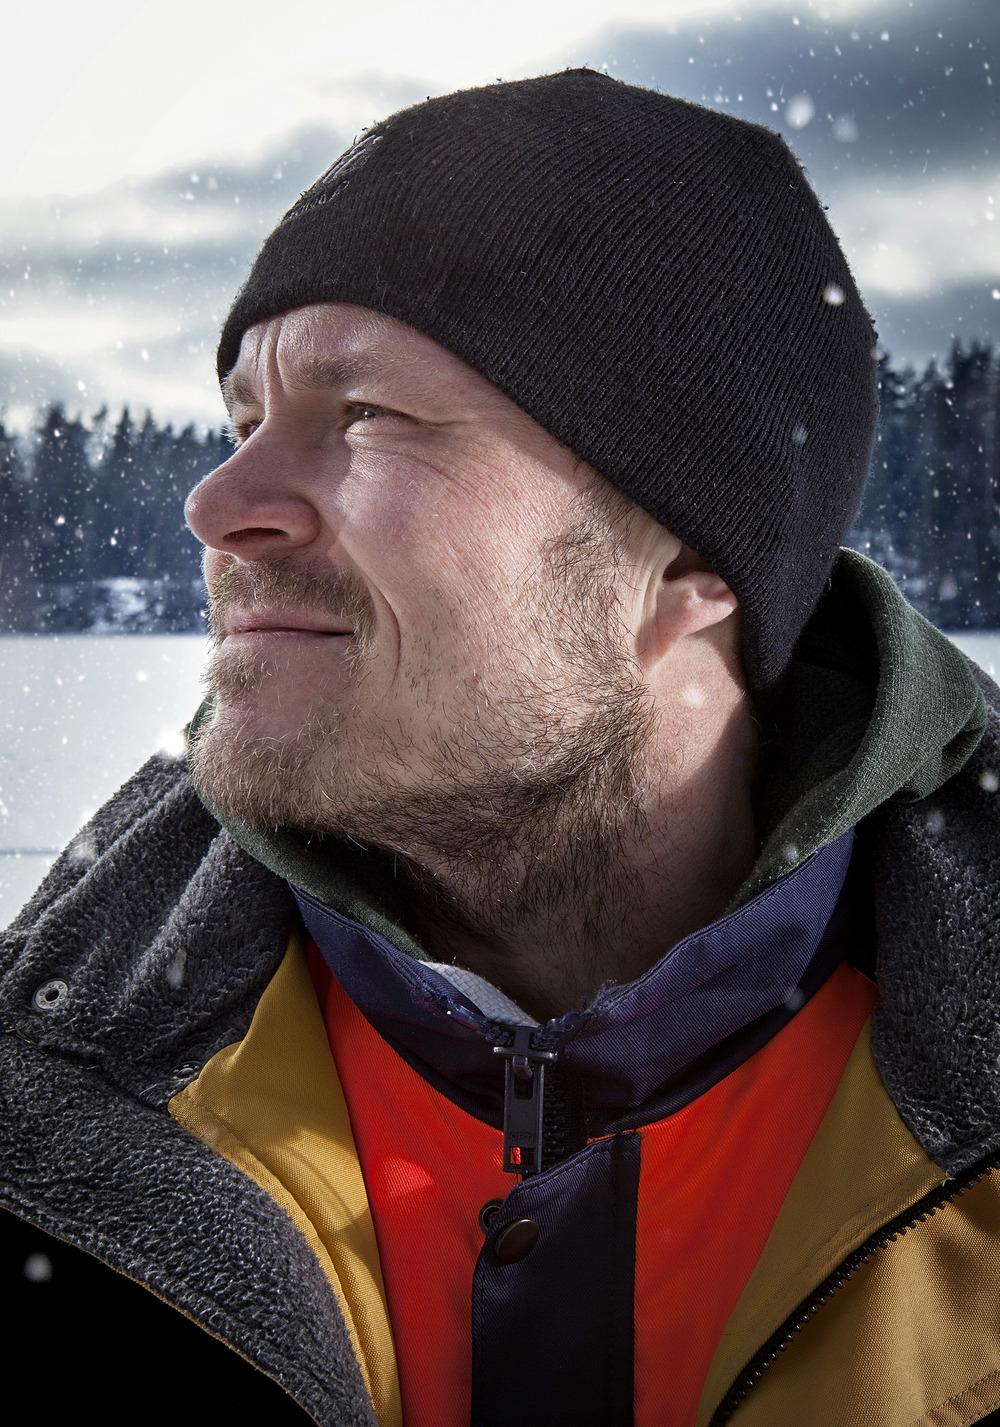 icefishing0008.jpg